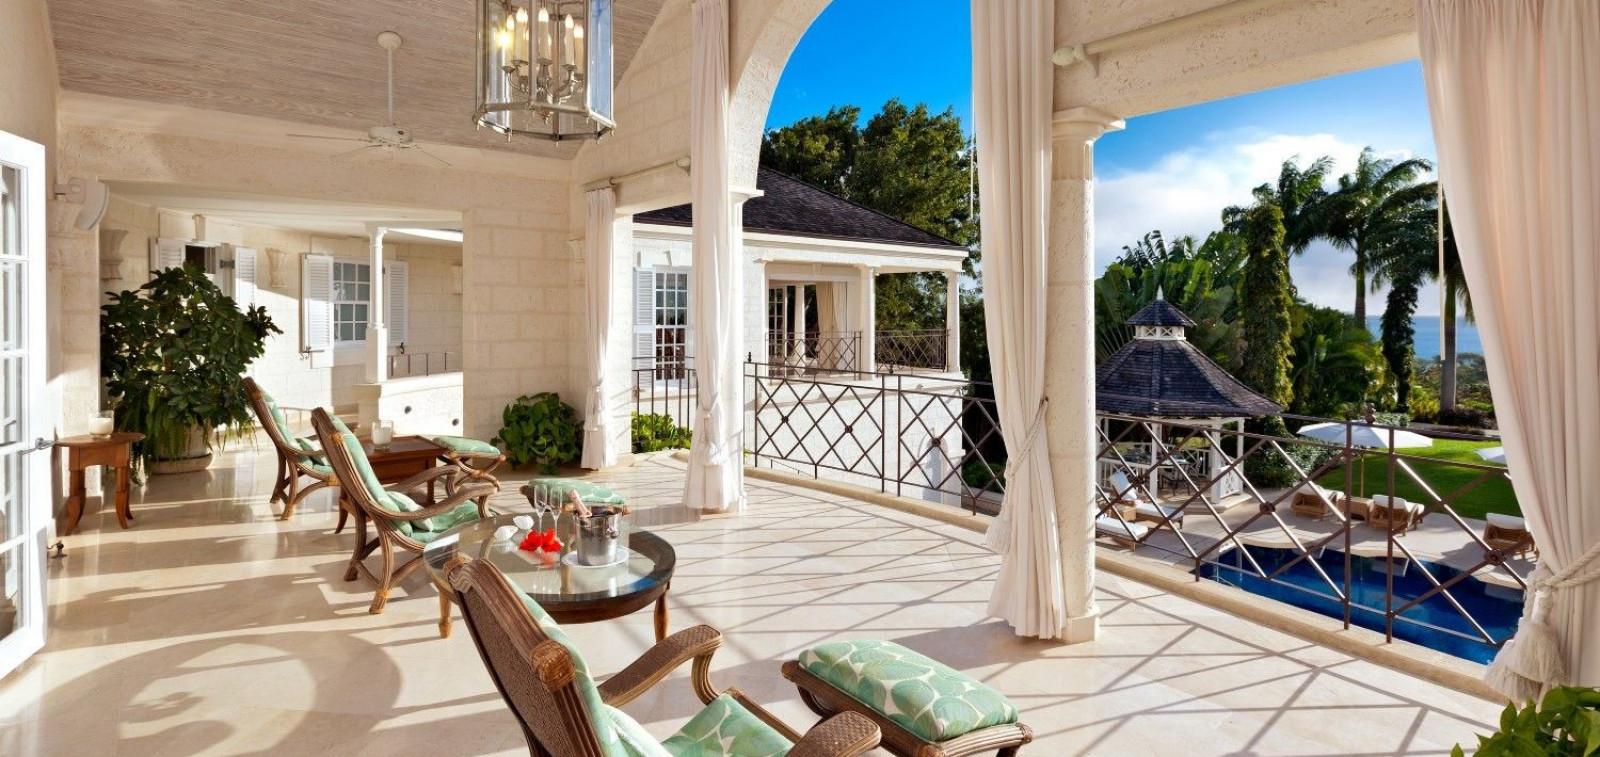 Porch with Sea Views 5 Bedroom Villa Sugar Hill, Barbados with Private Pool, Putting Green & Sea Views